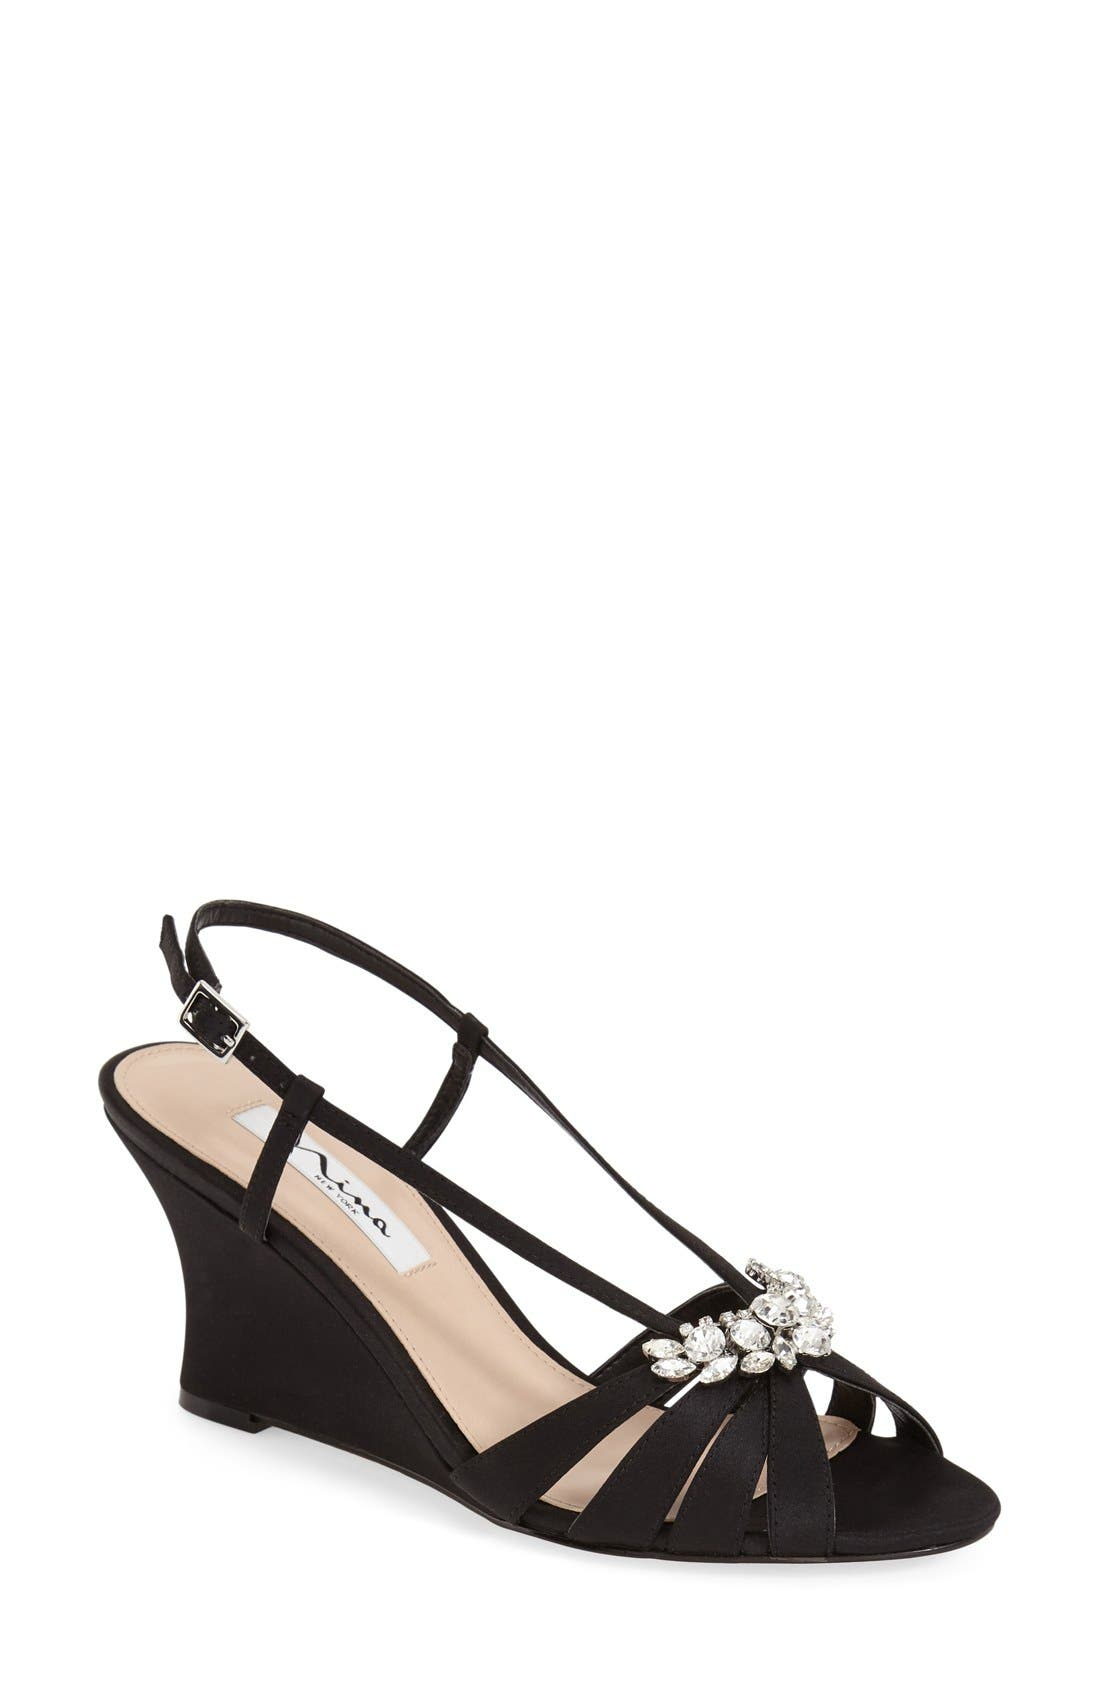 Alternate Image 1 Selected - Nina 'Voleta' Wedge Sandal (Women)